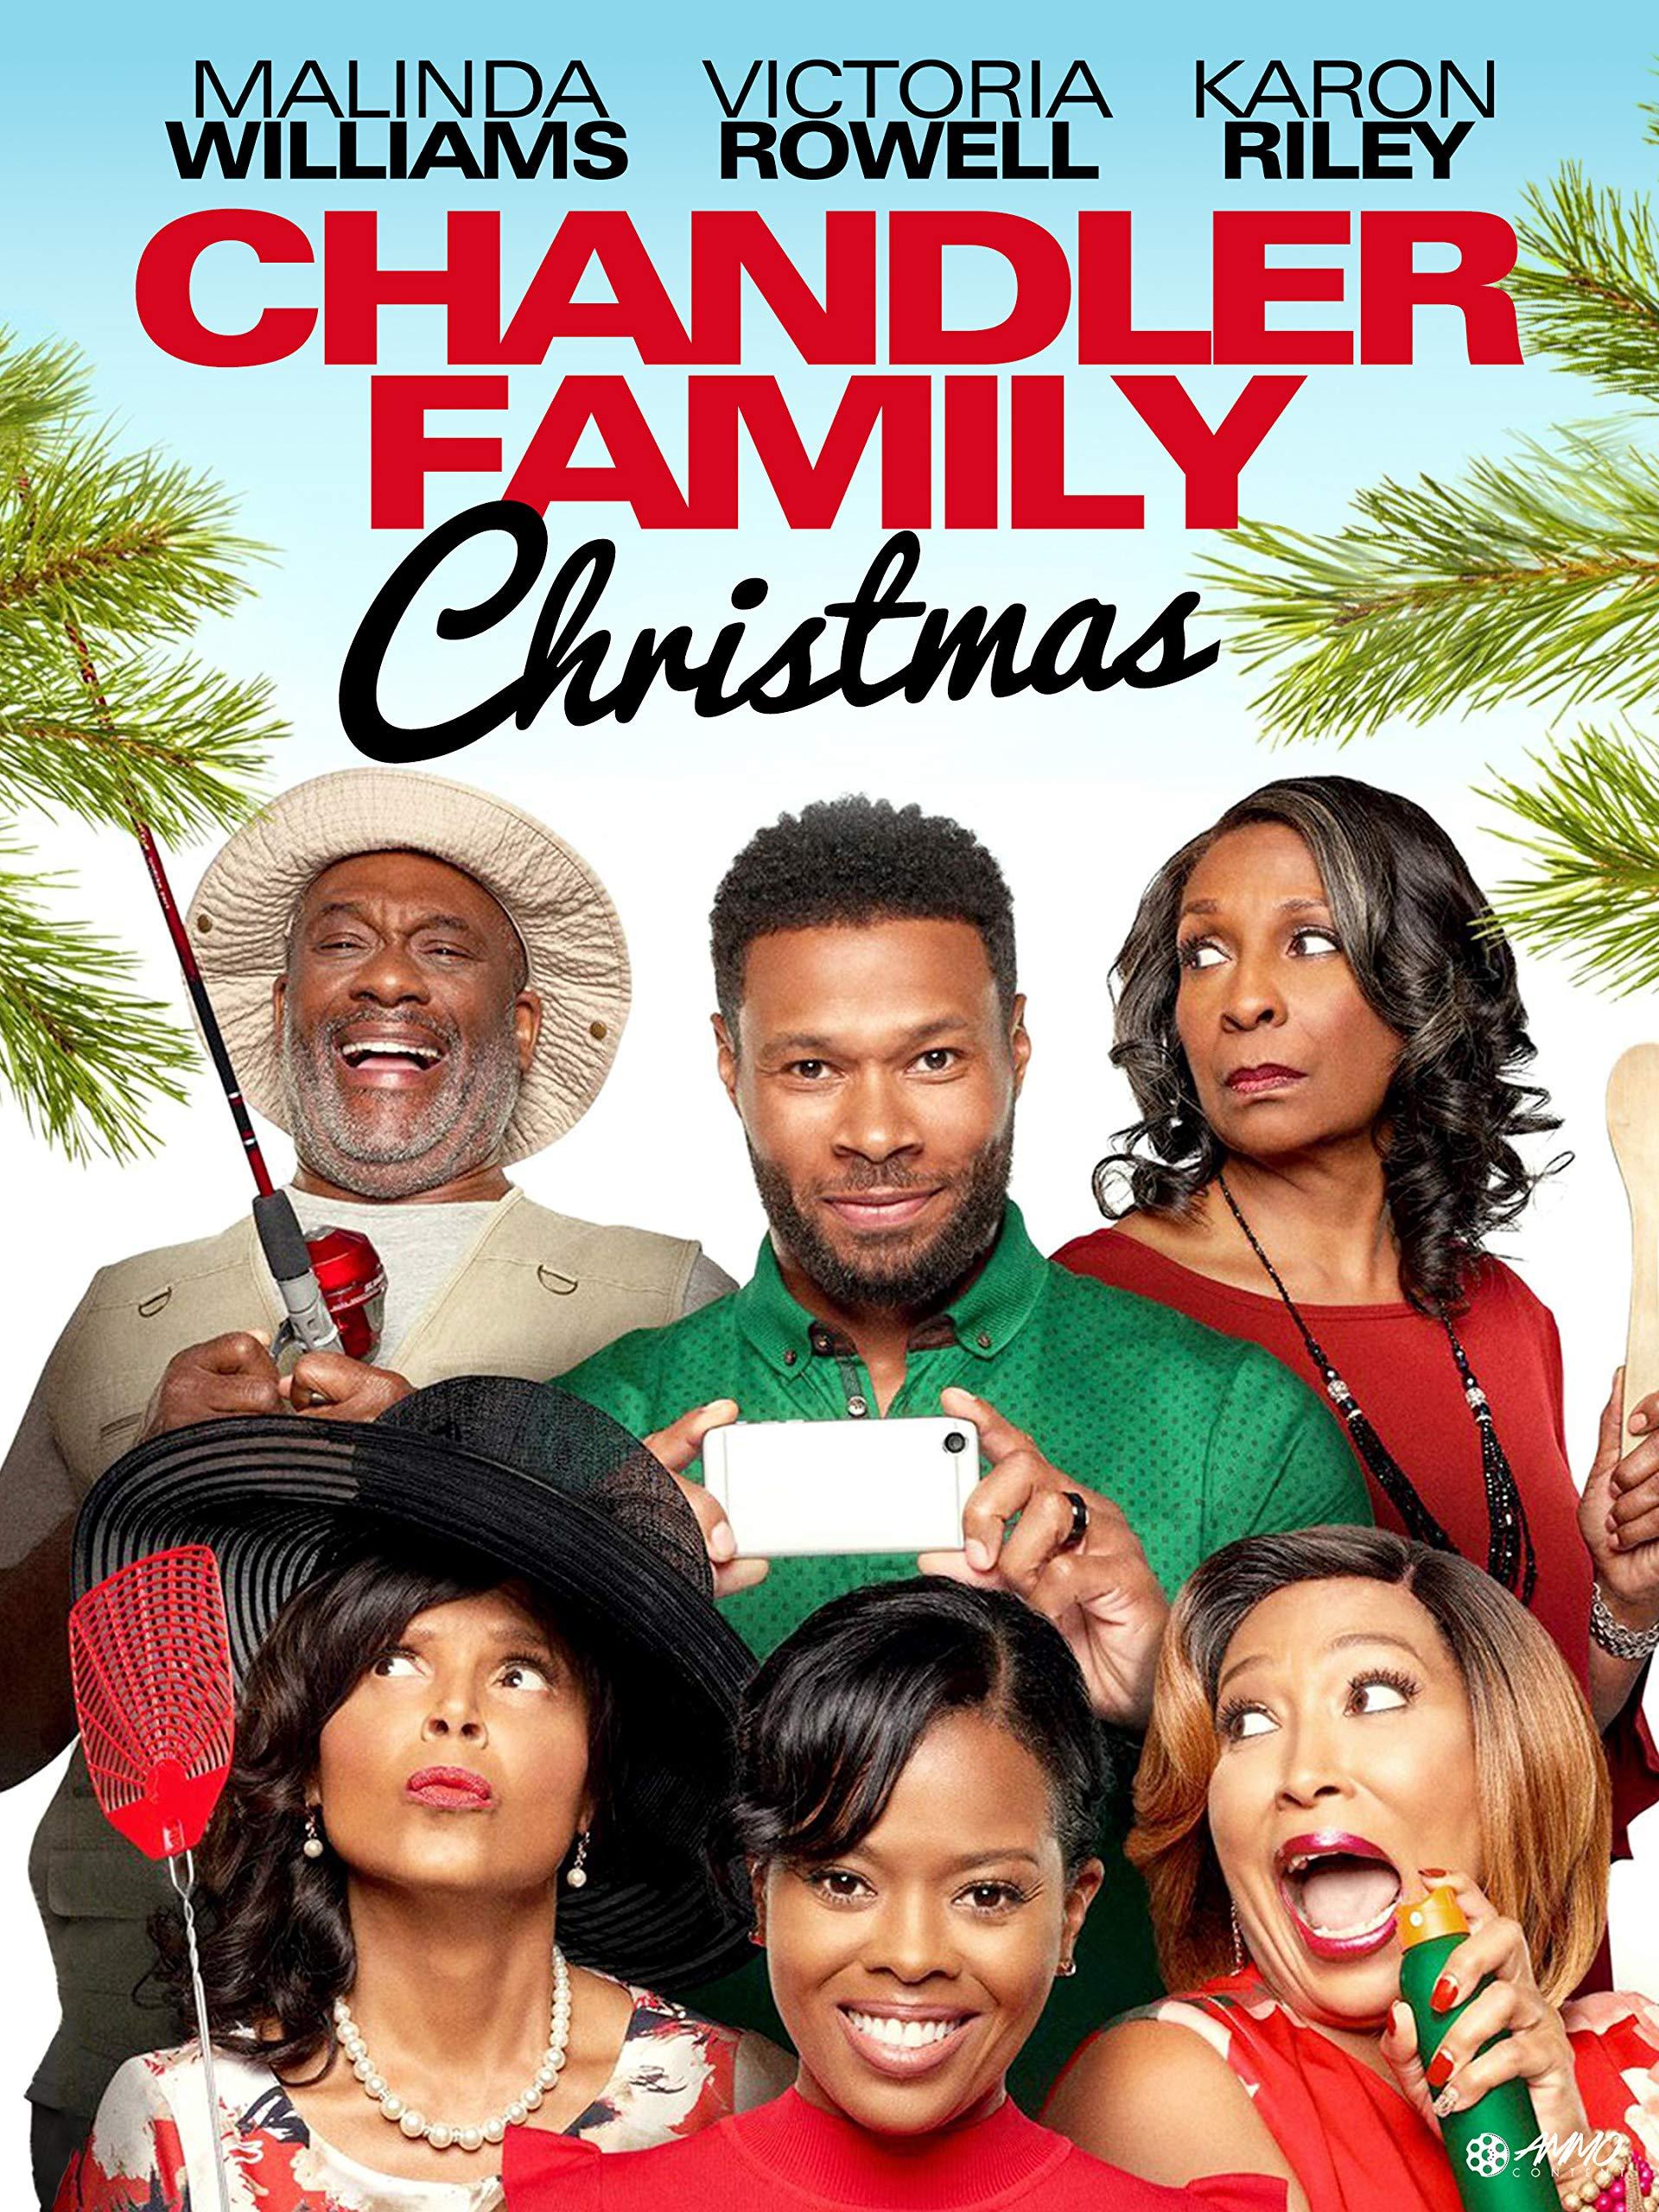 Chandler Family Christmas on Amazon Prime Video UK